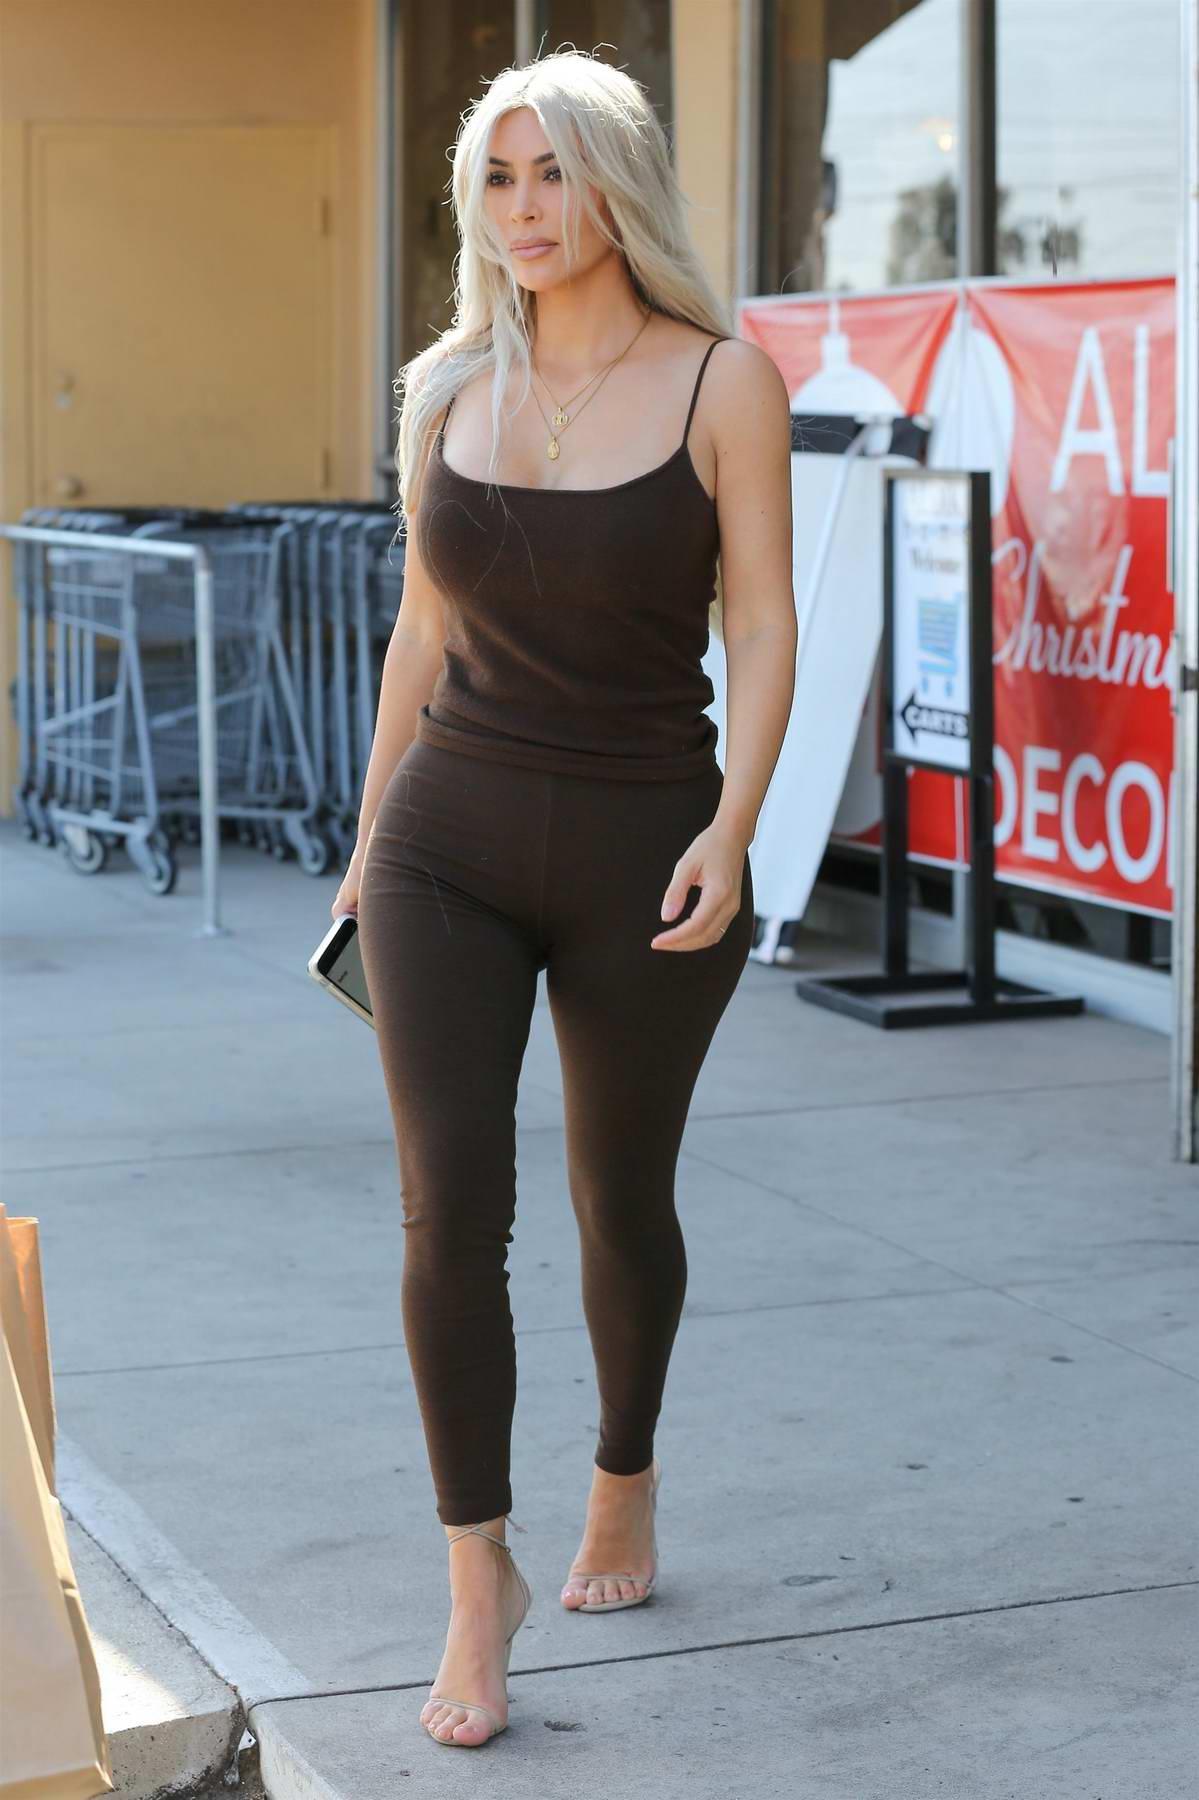 Kim Kardashian and Kourtney Kardashian are seen leaving the Aldik Home Store in Van Nuys, California